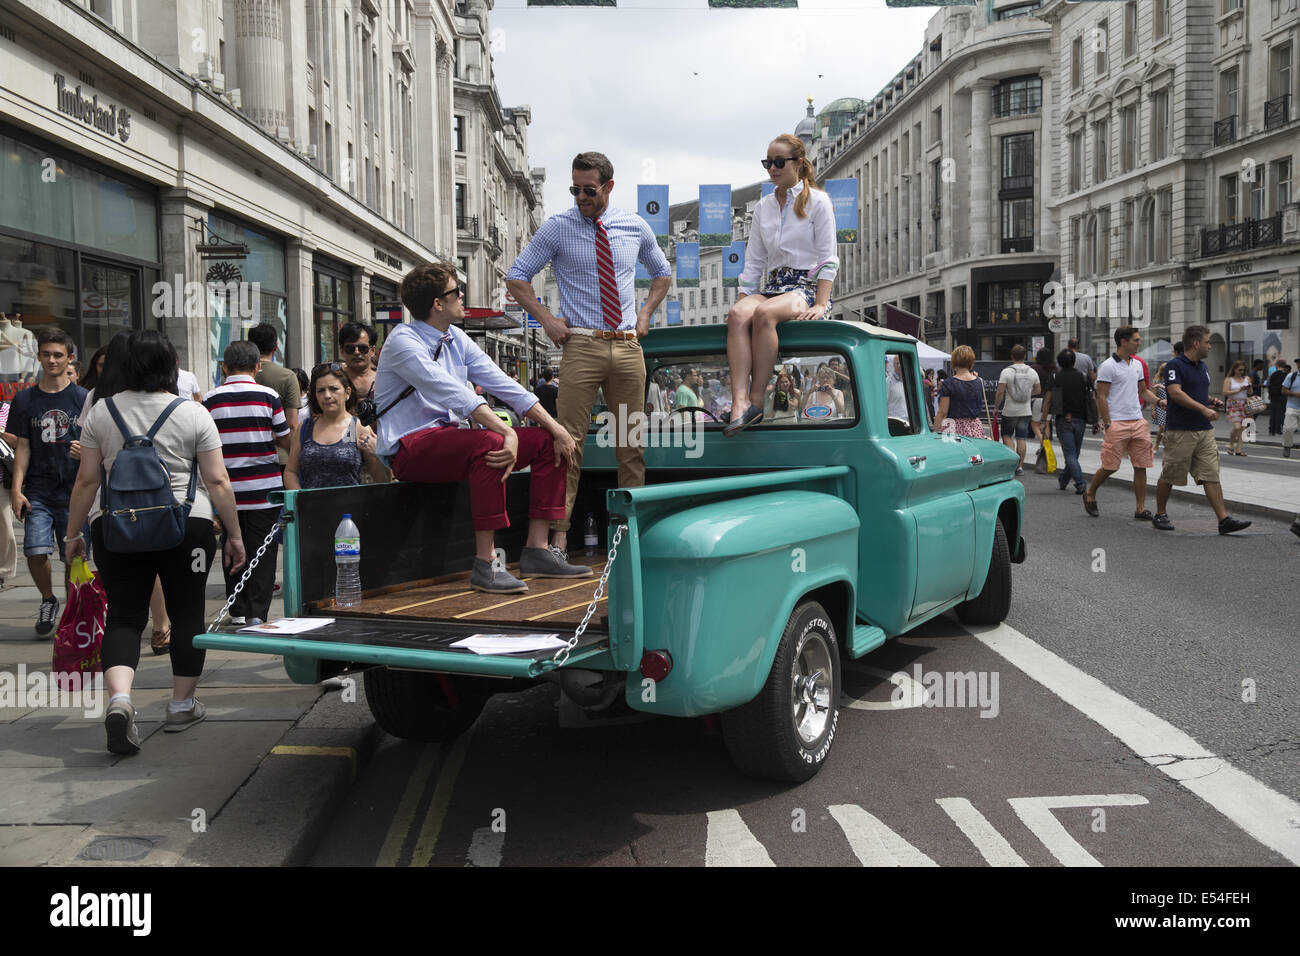 London, UK. 20th July, 2014. Regent Street Traffic-Free Sundays in July, Chevrolet Pick-up exhibit, Regent Street - Stock Image